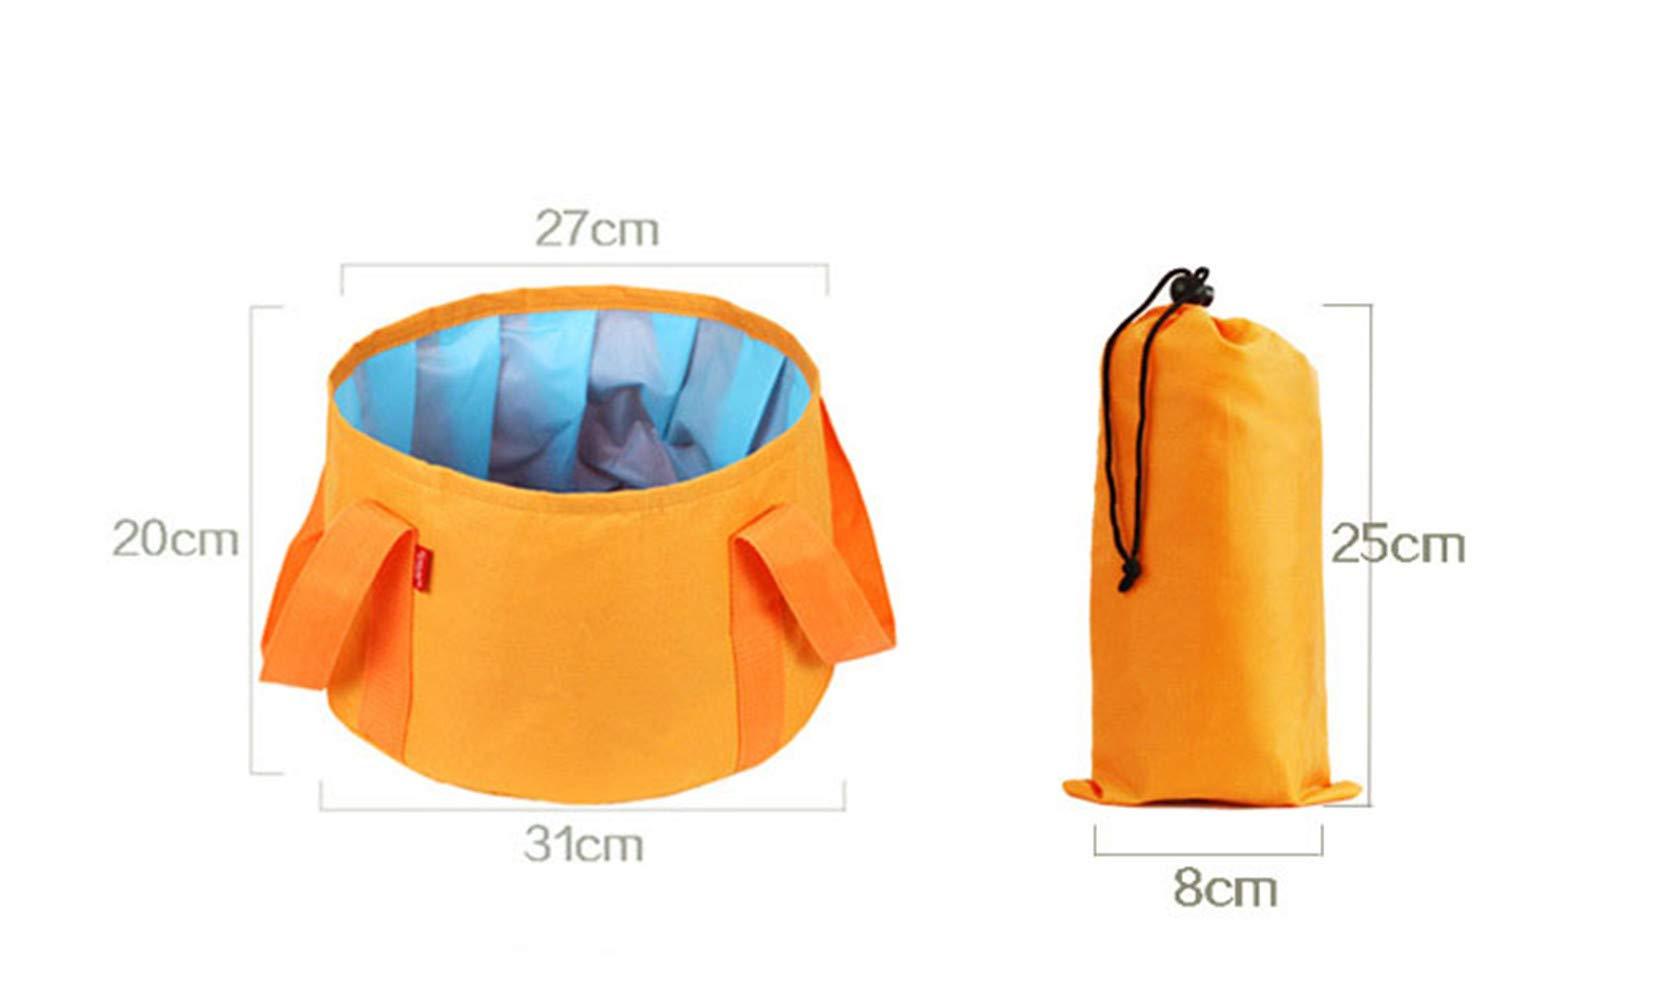 Modi Multifunctional Collapsible Portable Travel Outdoor Wash Basin Folding Bucket for Camping Hiking Travelling Fishing Washing (Camouflage Blue)